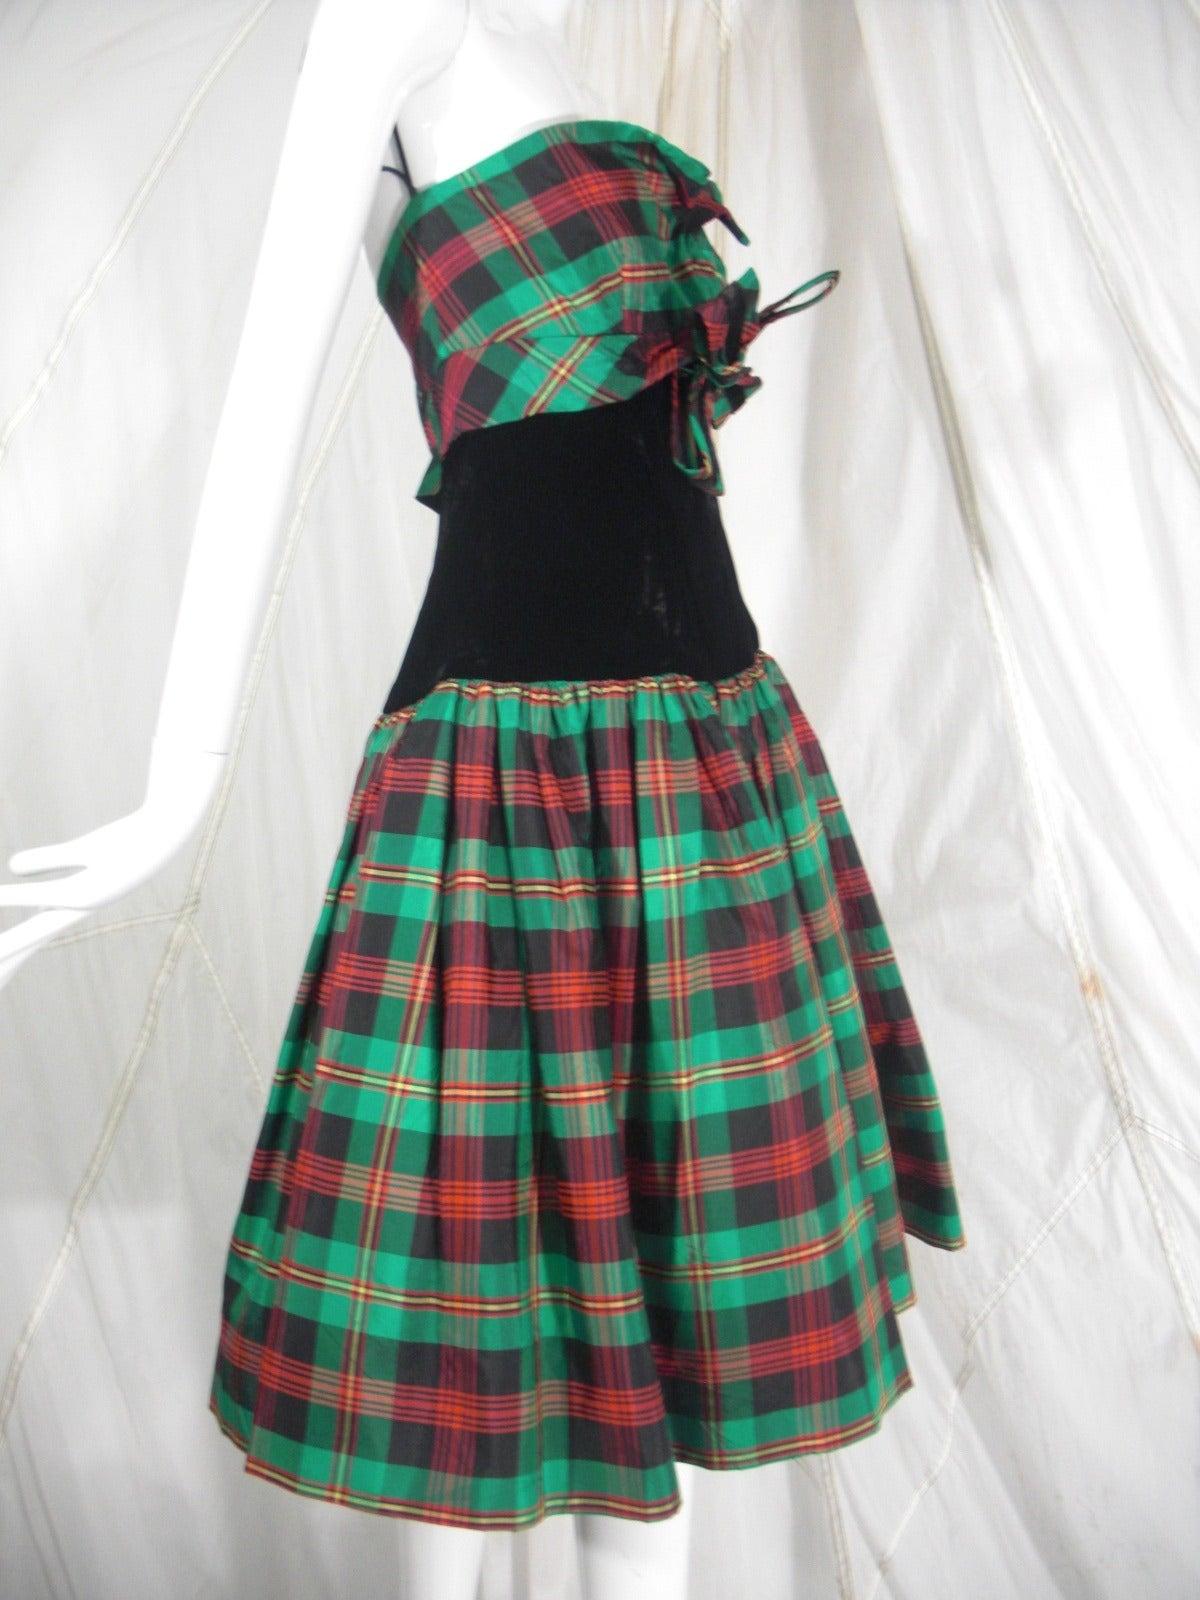 Victor Costa for SAKS 5th Avenue Green Plaid and Velvet Dress 2